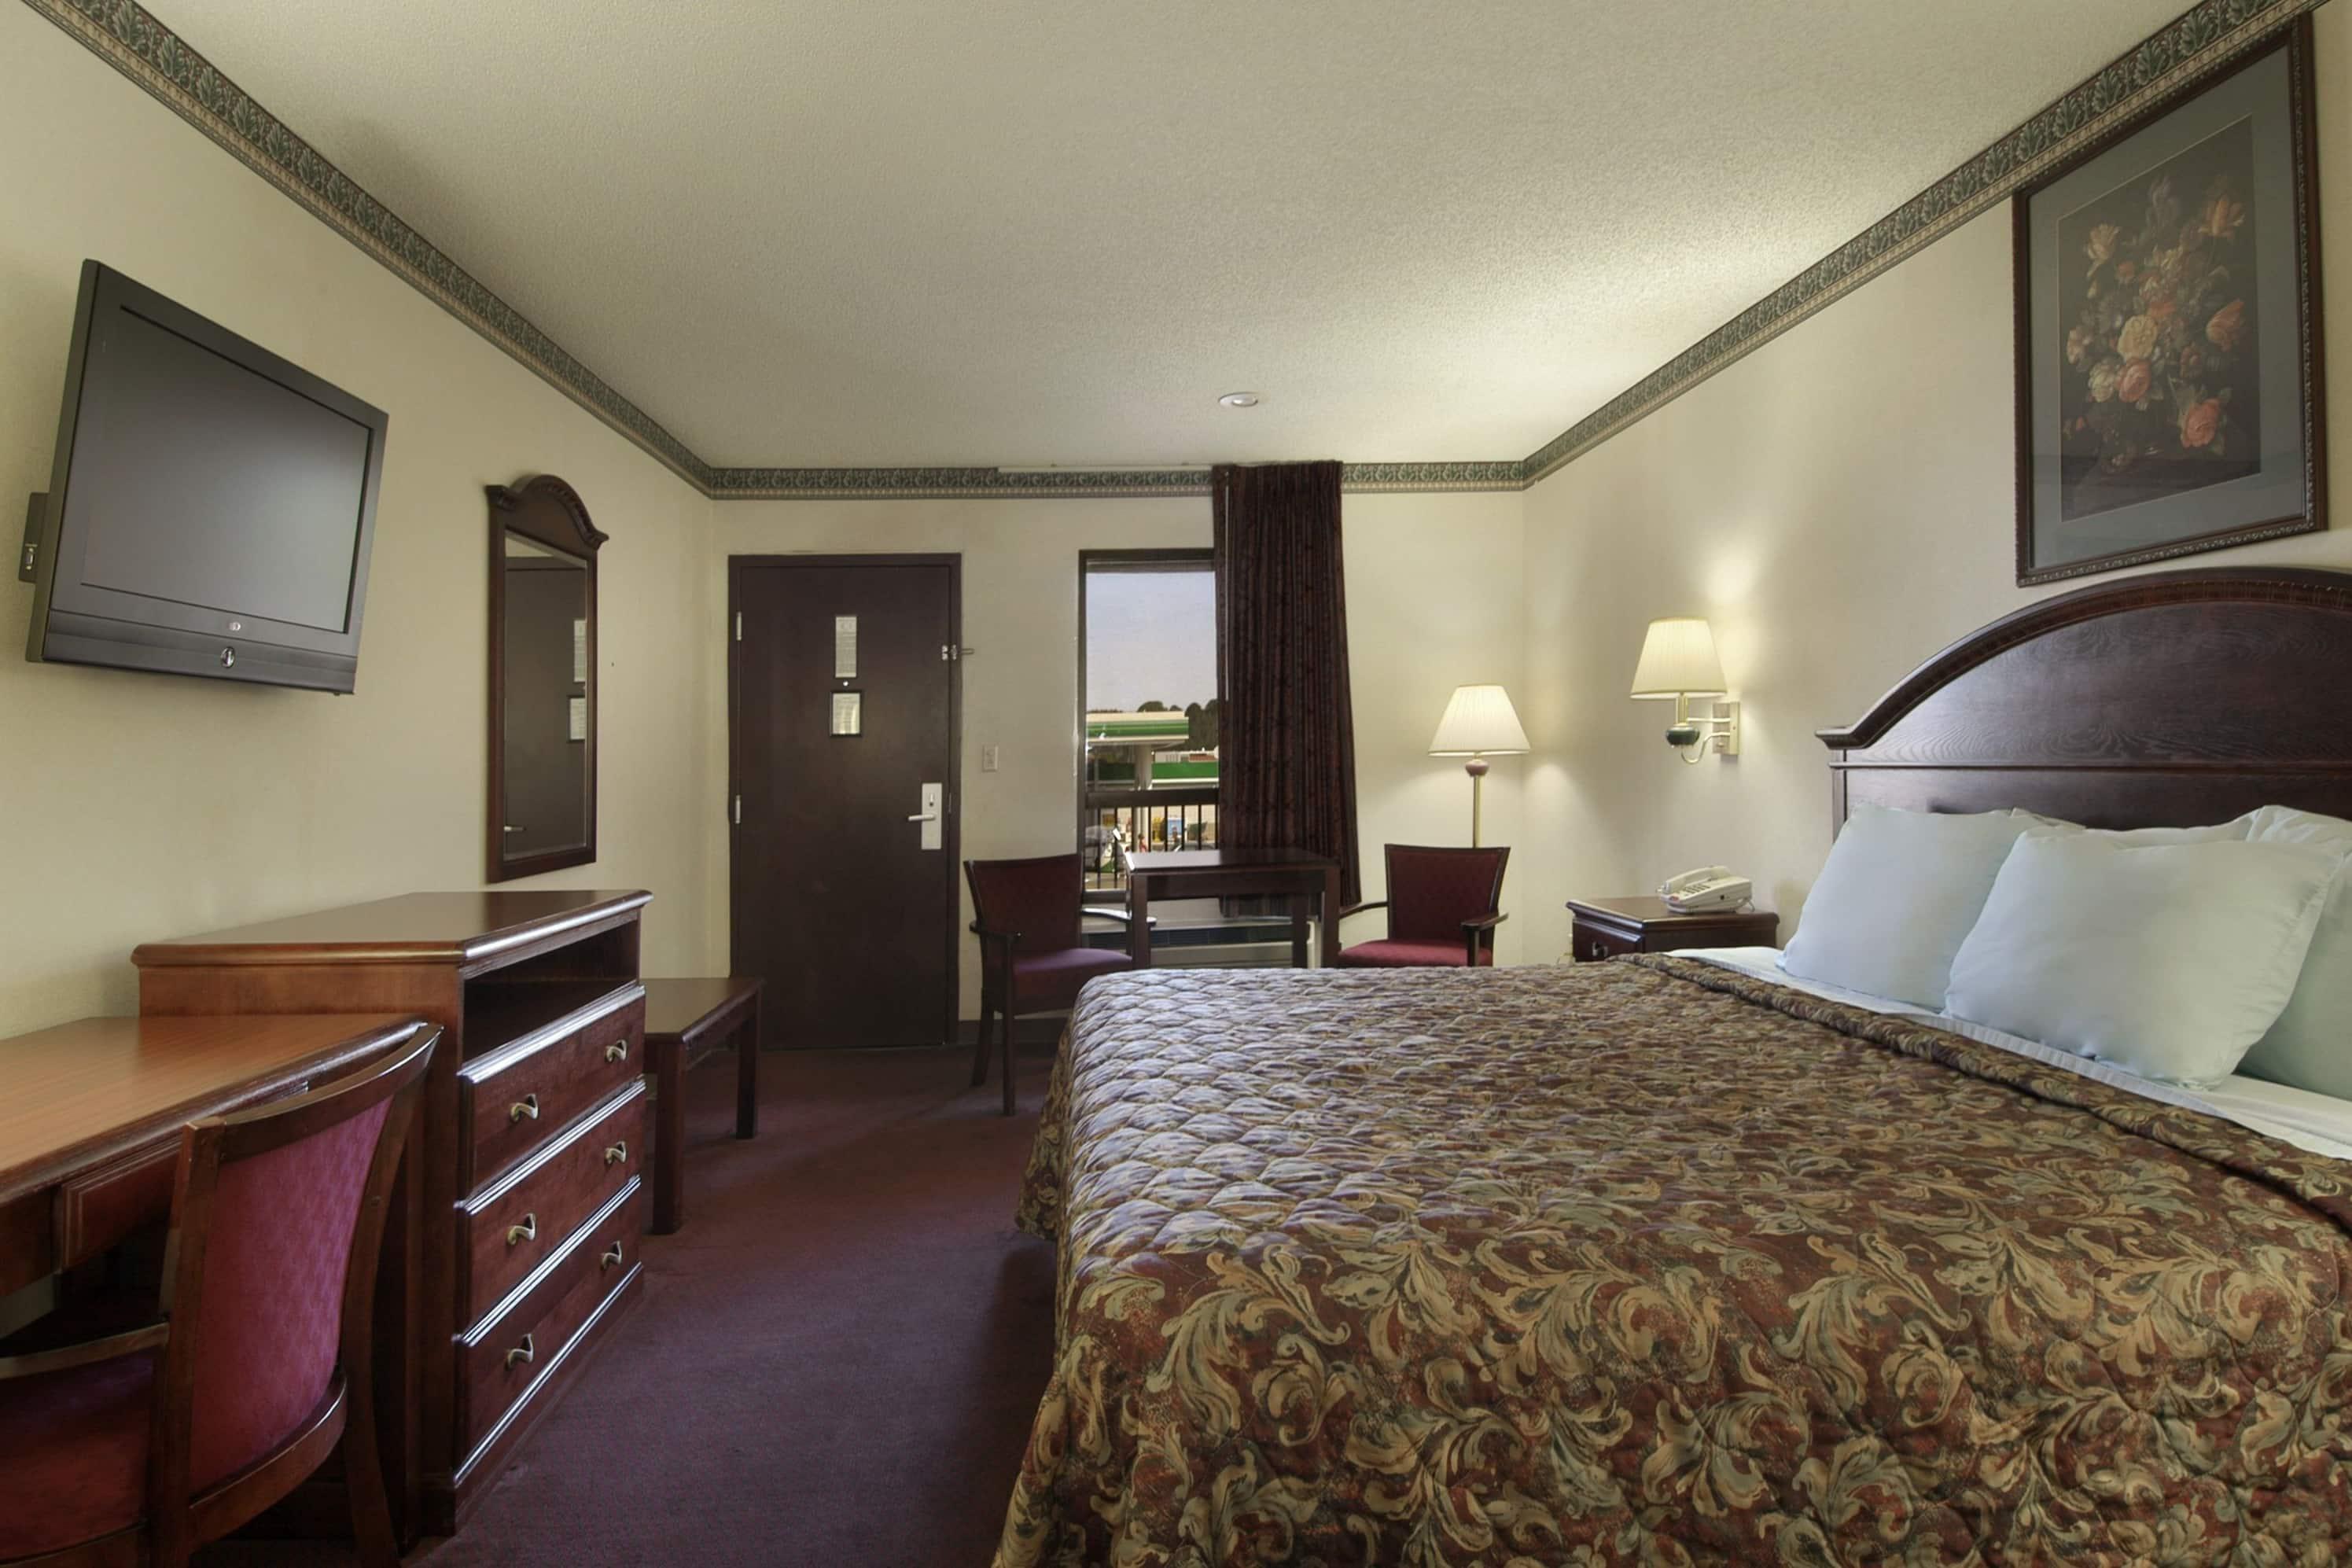 Guest room at the Days Inn Bainbridge in Bainbridge, Georgia